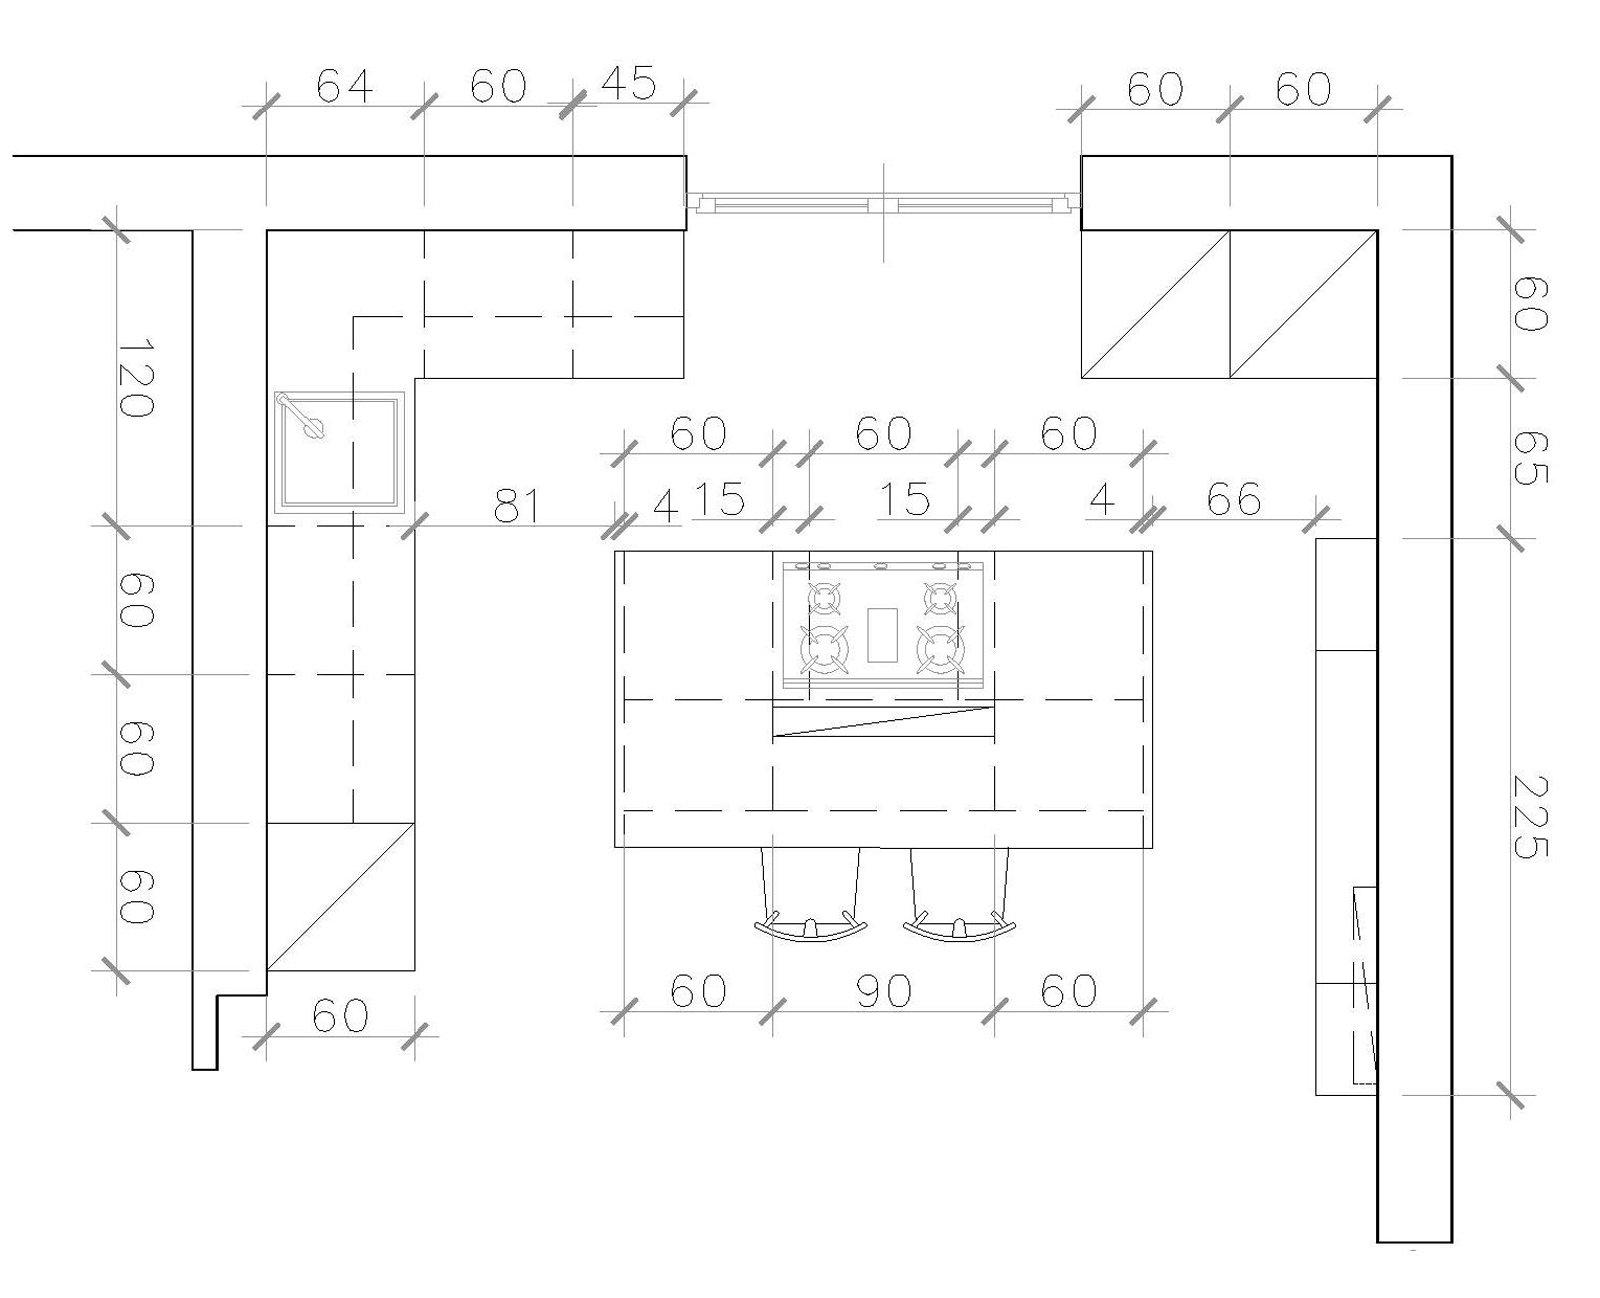 115 Misure Isola Cucina - tavolo cucina dimensioni, cucine ...